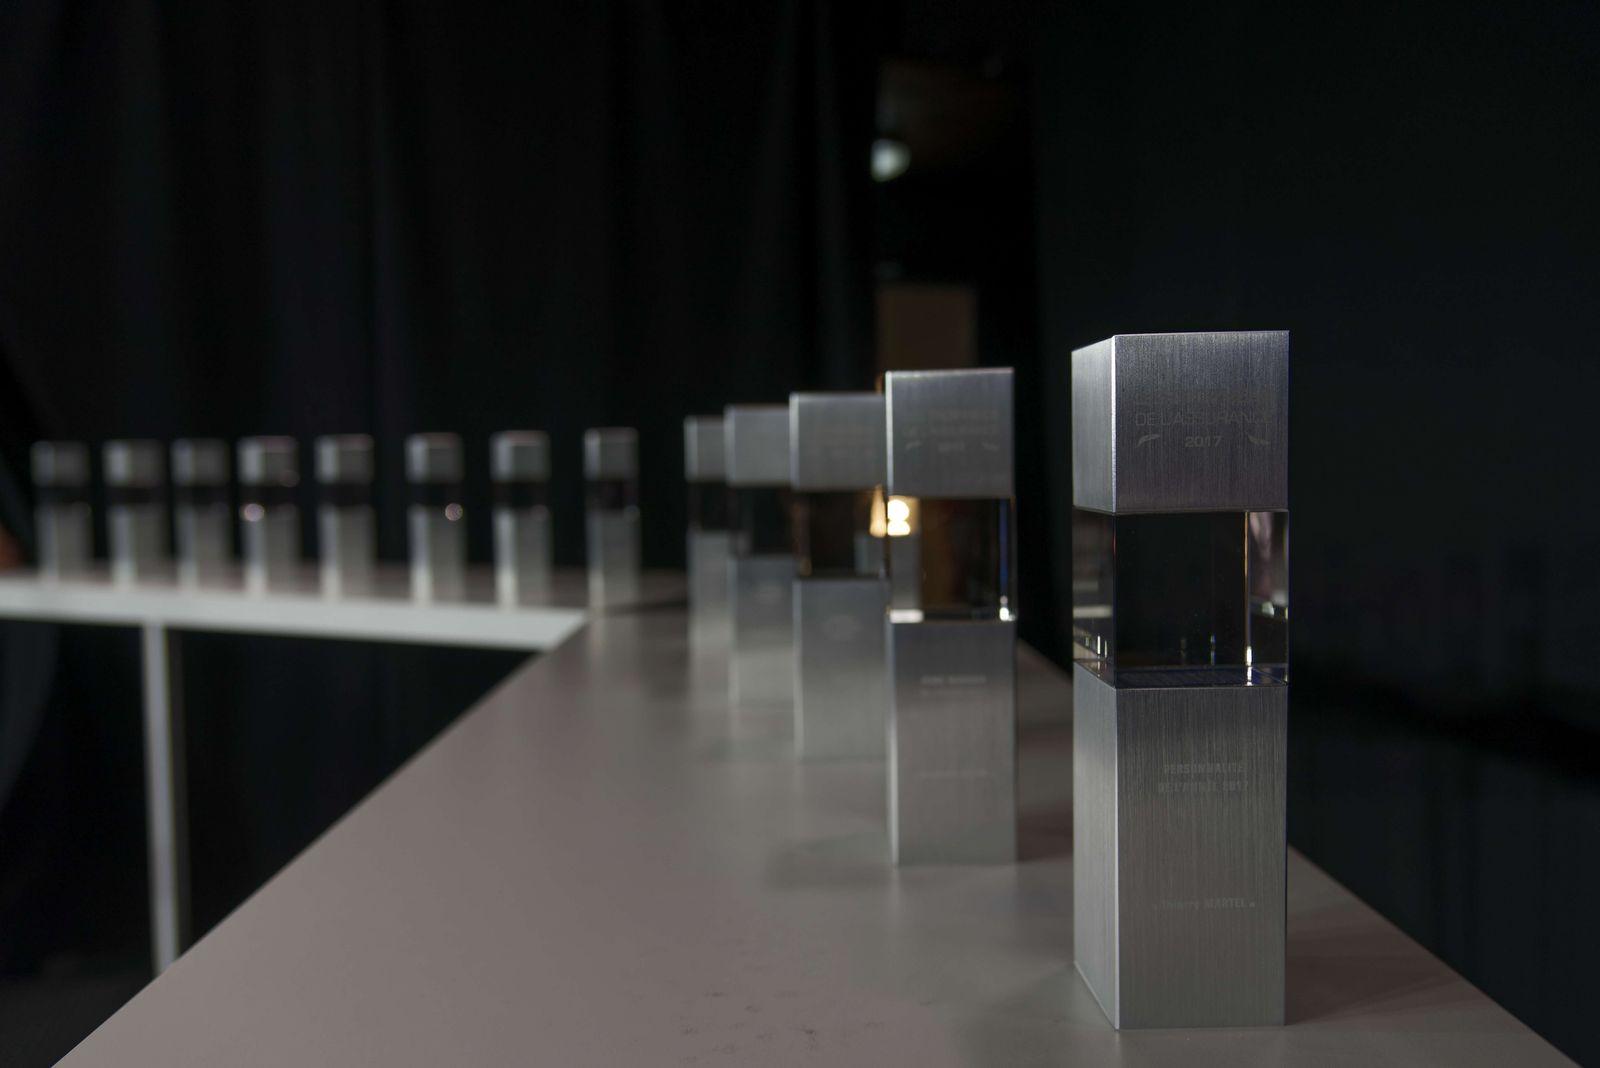 pr voyance et sant axa france cipr s assurances et eovi mcd mutuelle gagnent l or aux. Black Bedroom Furniture Sets. Home Design Ideas